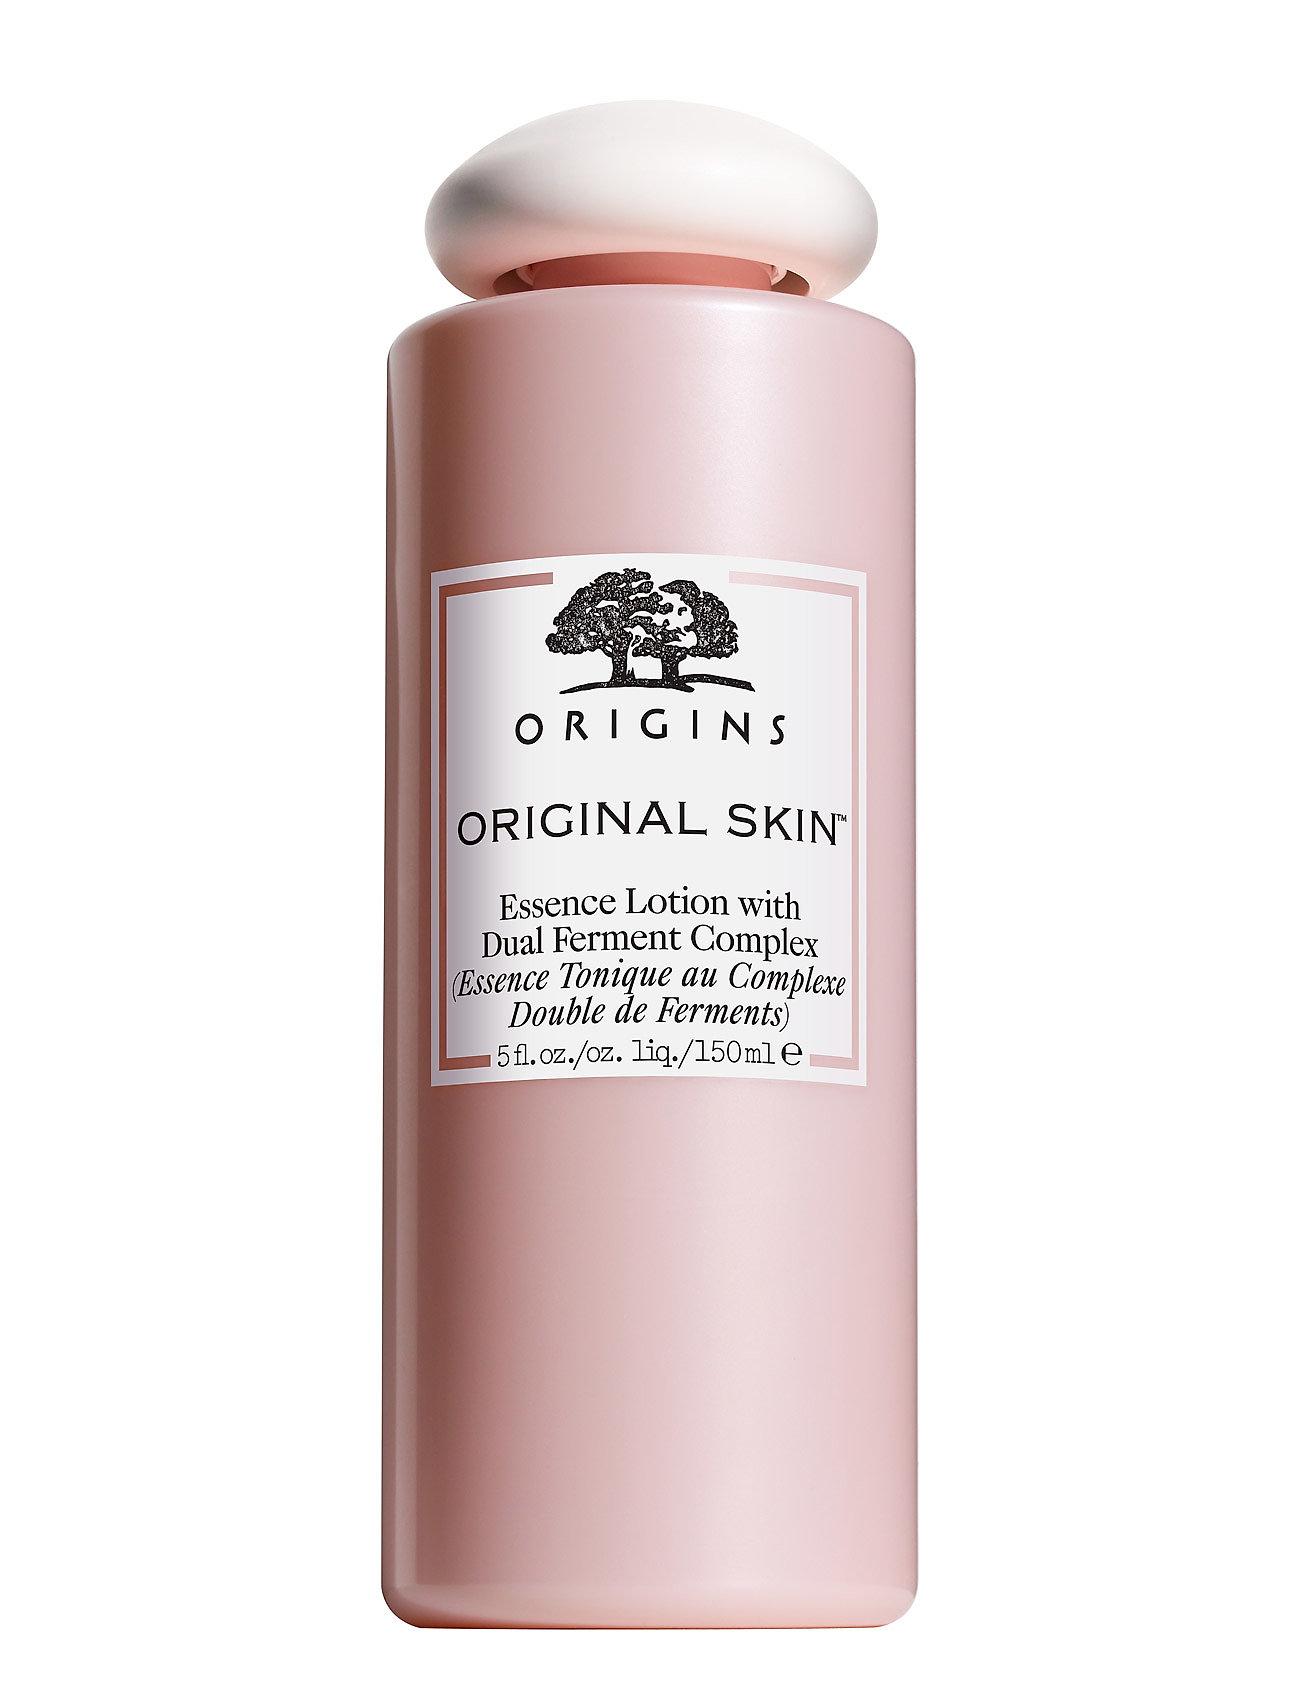 origins Original skin™ essence lotion with dual ferment complex på boozt.com dk